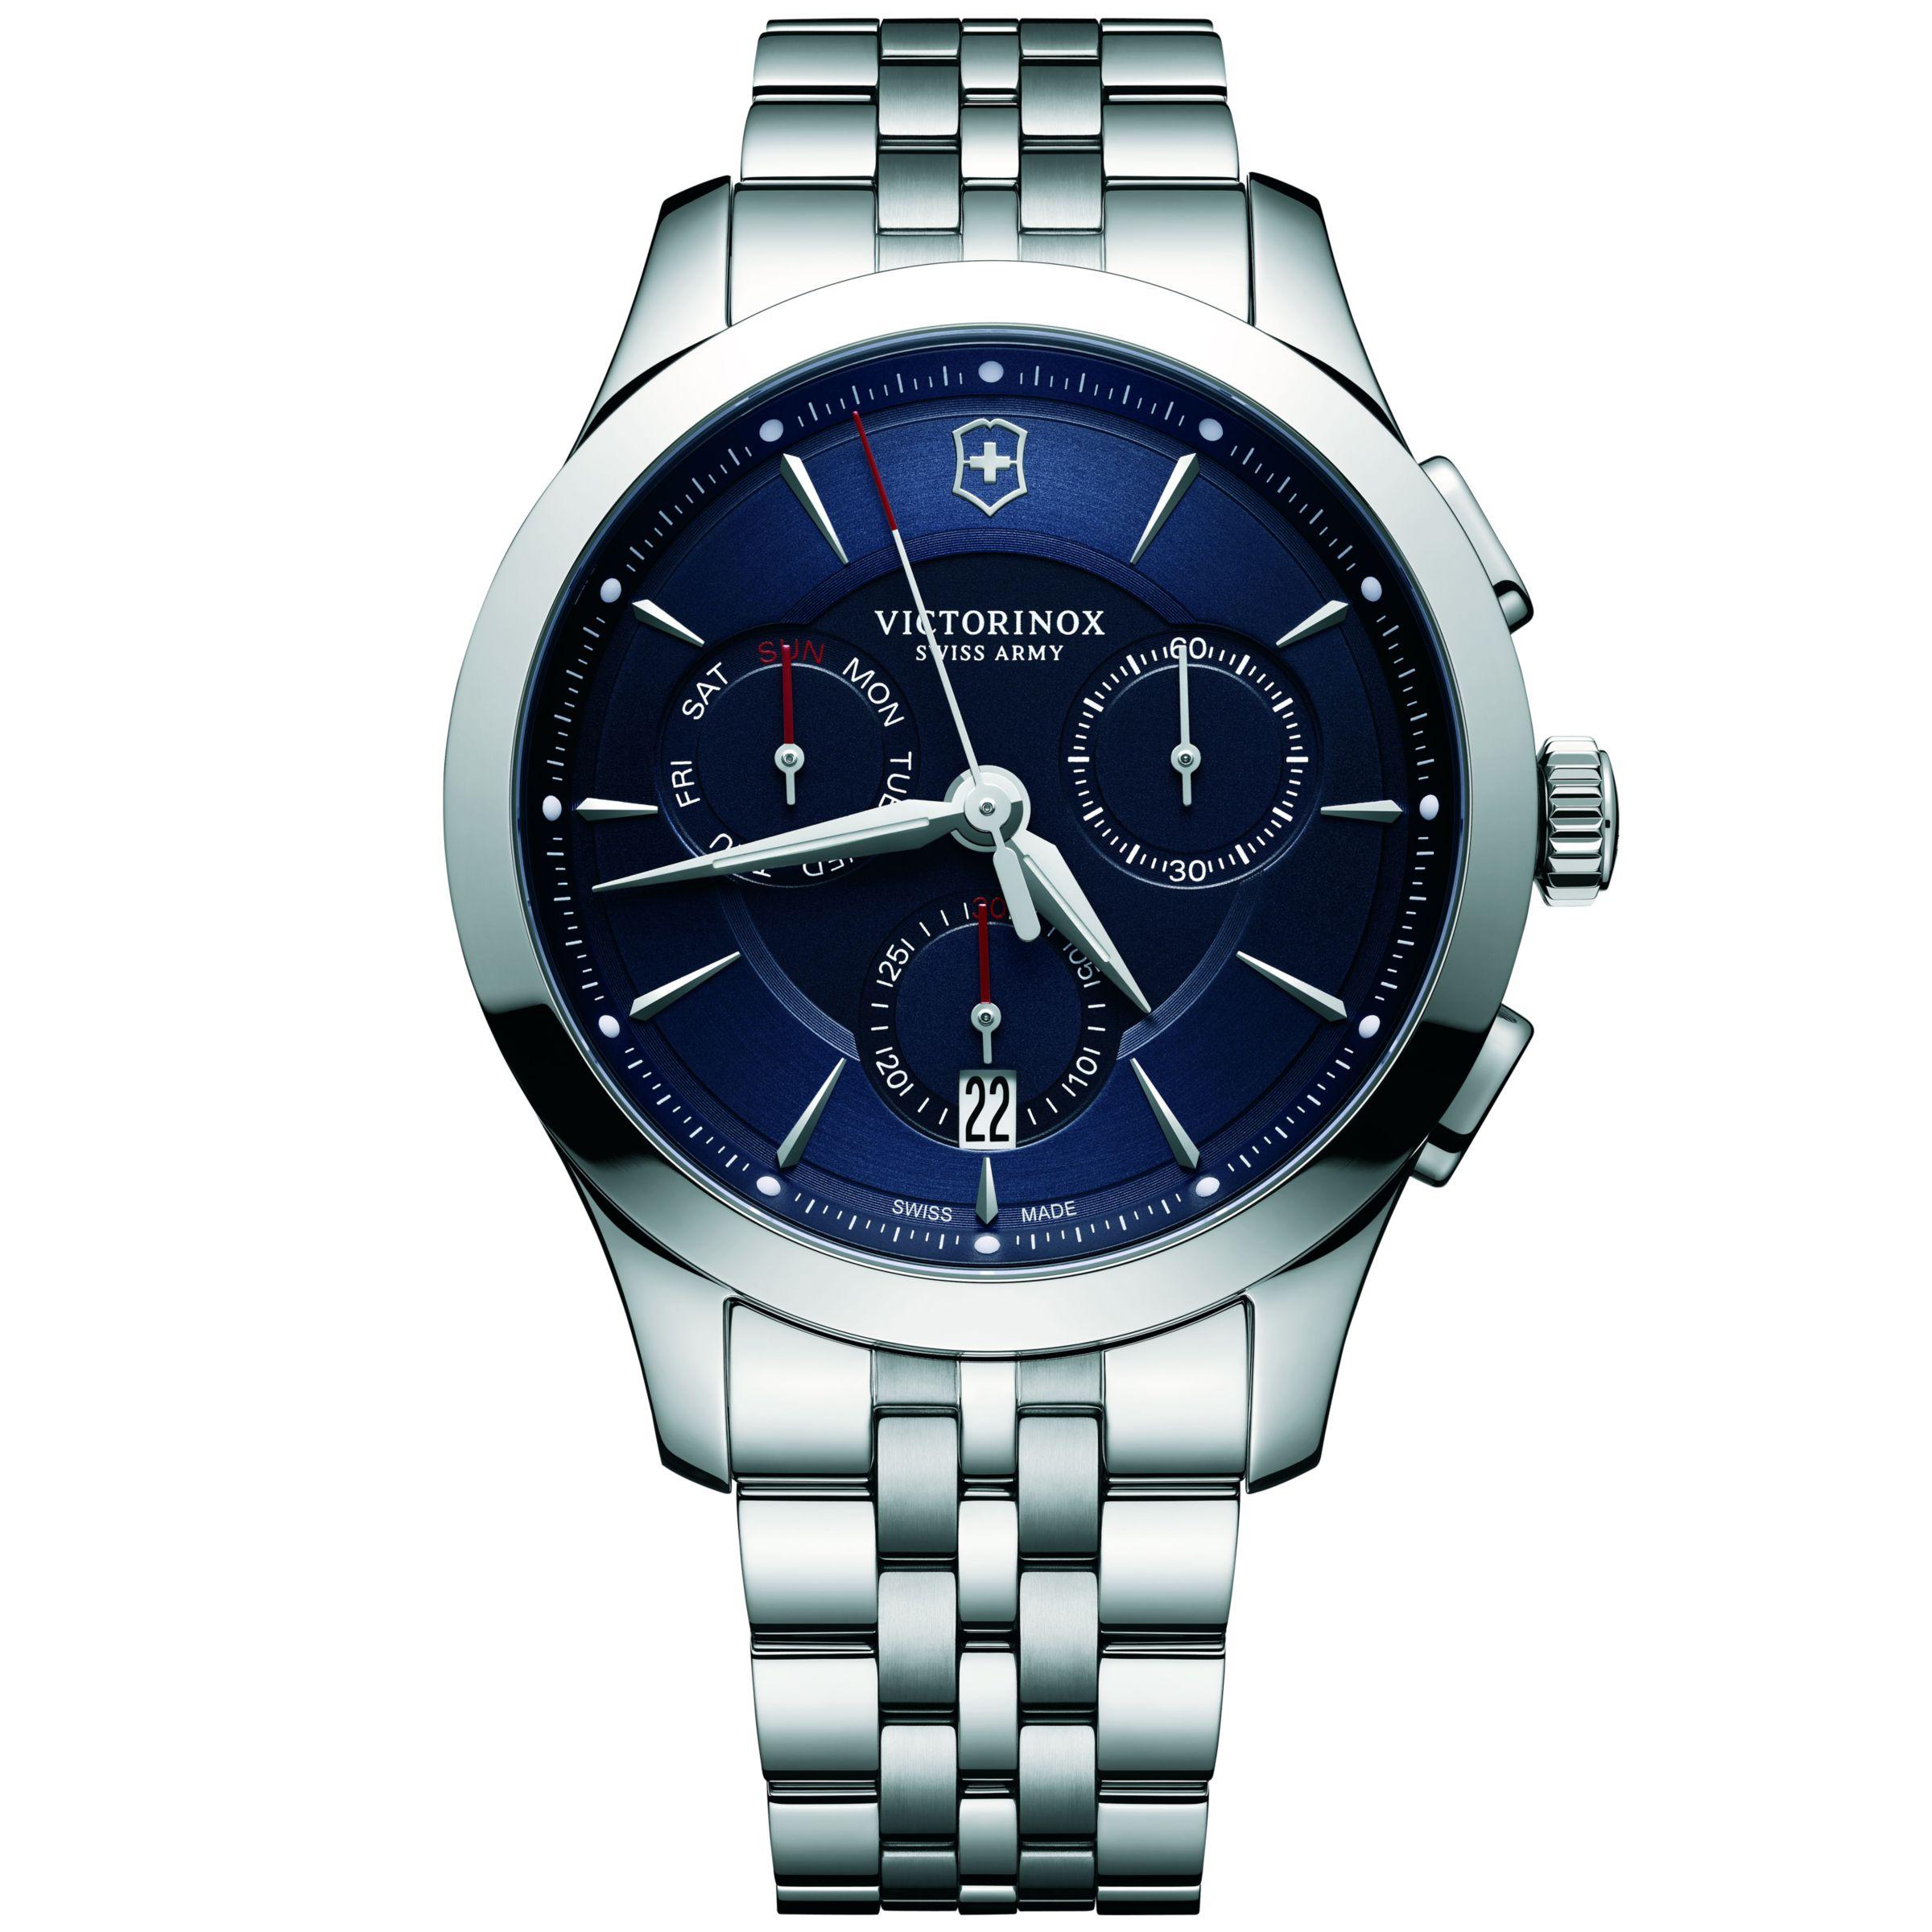 Victorinox Victorinox 241746 Men's Alliance Chronograph Day Date Bracelet Strap Watch, Silver/Blue